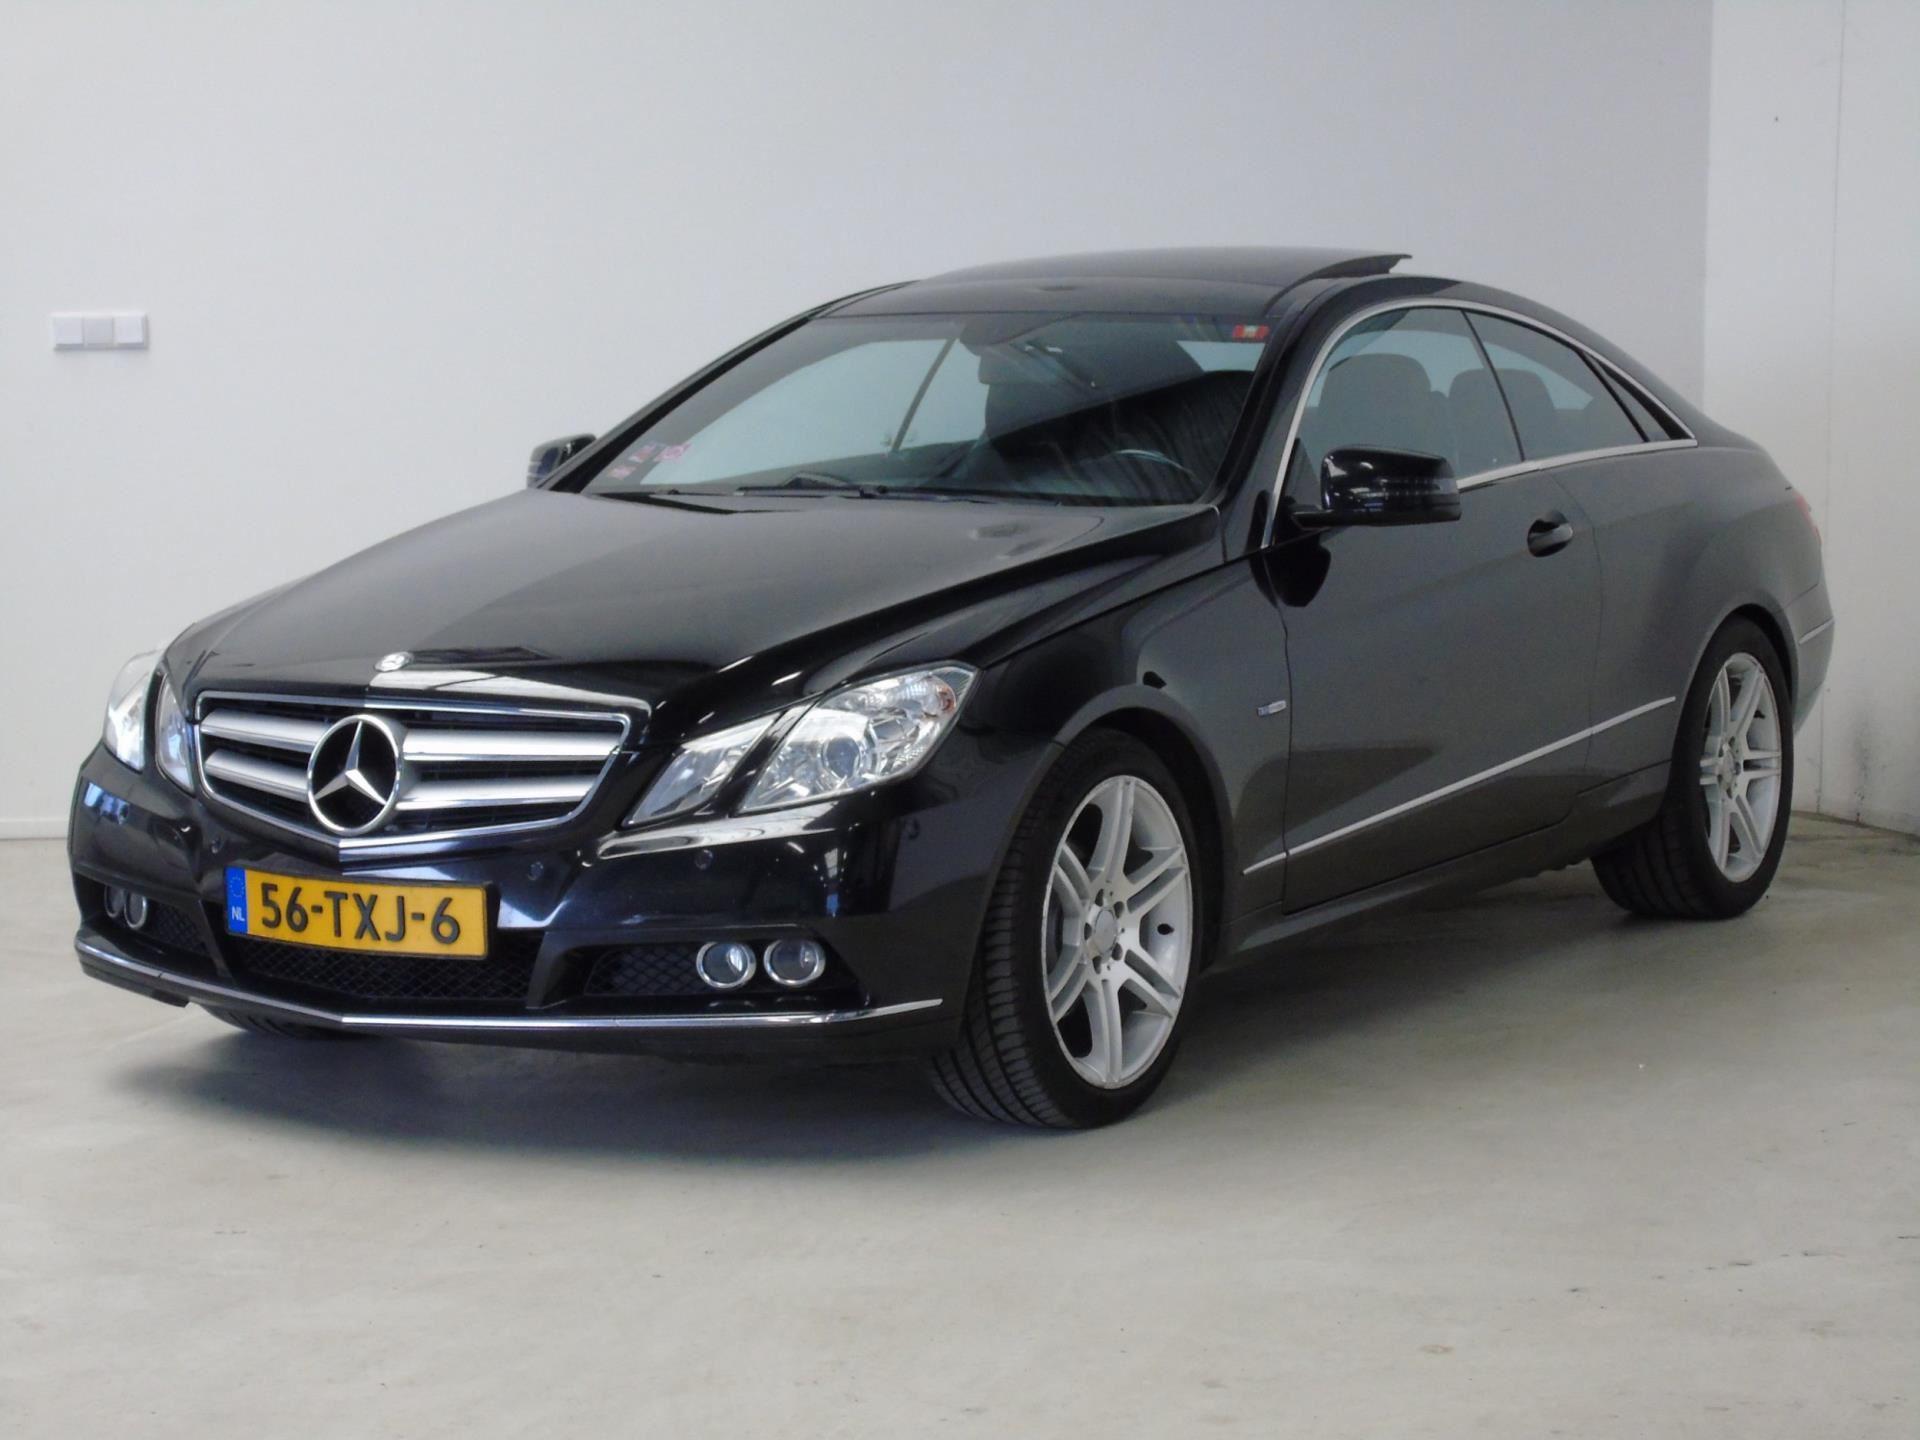 Mercedes-Benz E-klasse Coupé occasion - van Dijk auto's